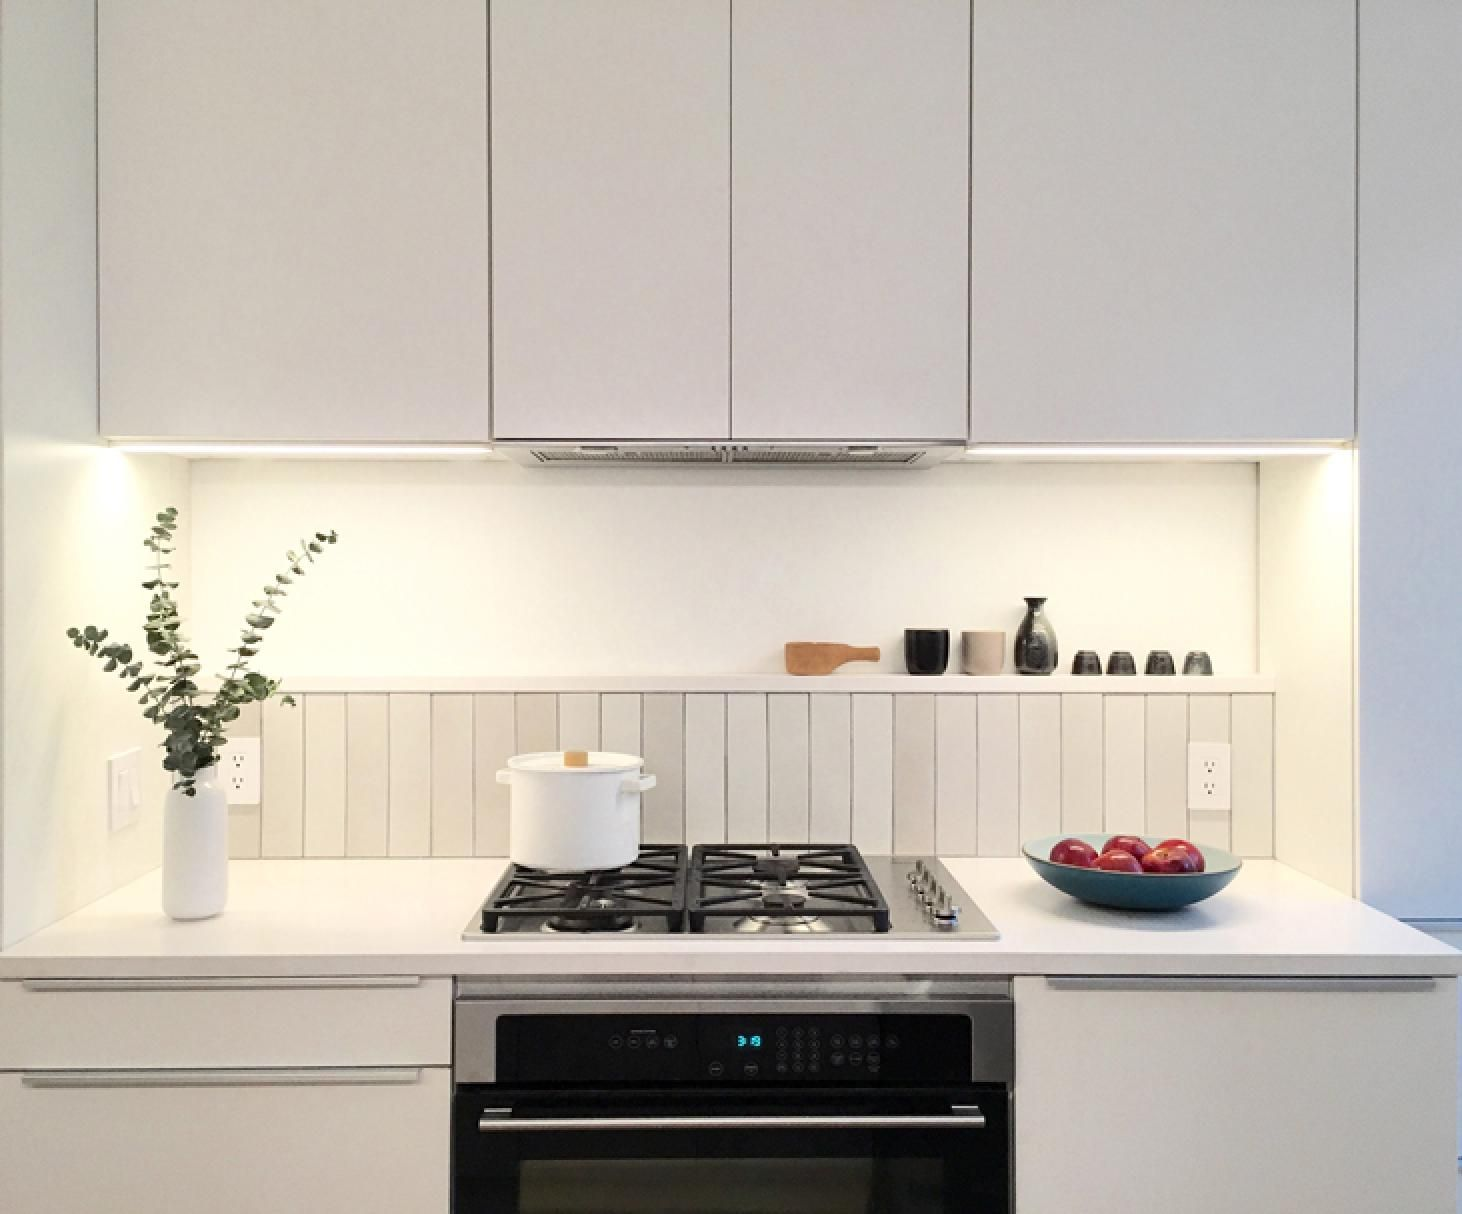 Installation Inspiration - Heath Ceramics   Tile + Floors in